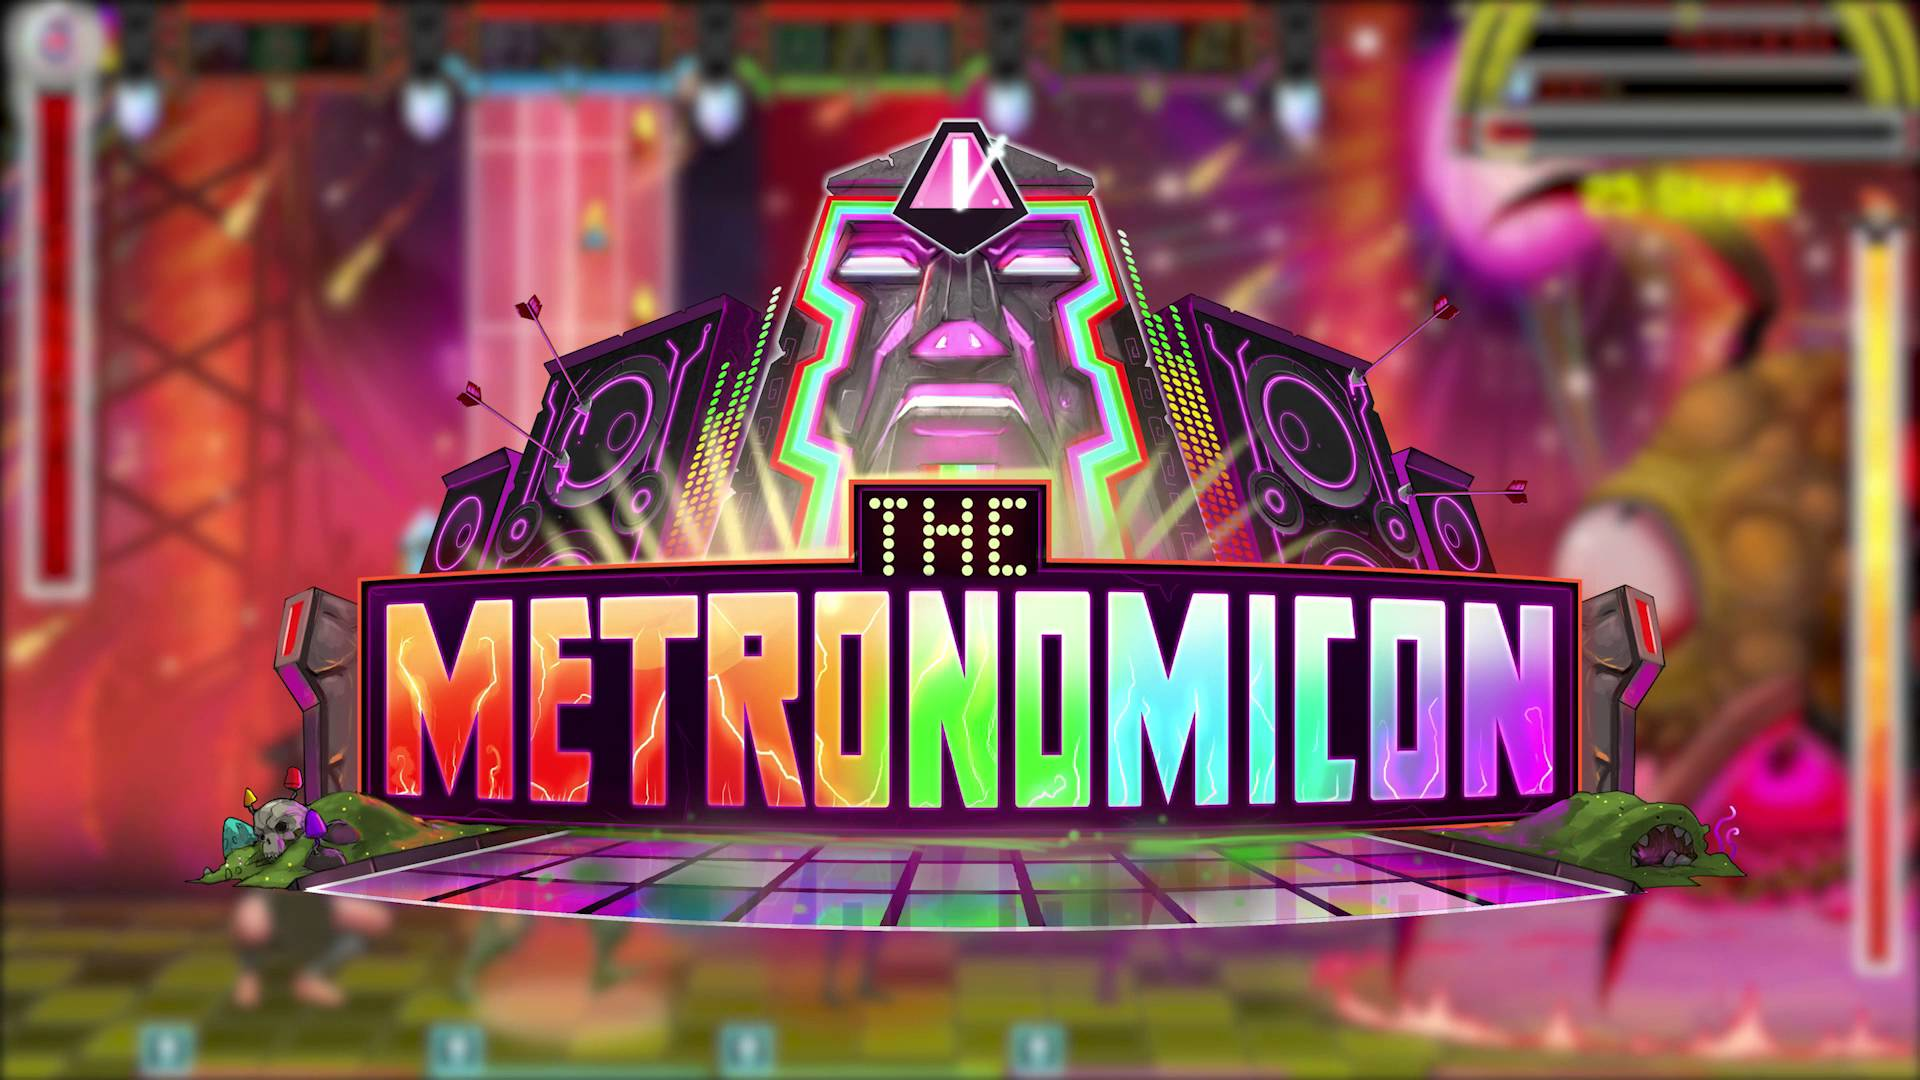 Metronomicon